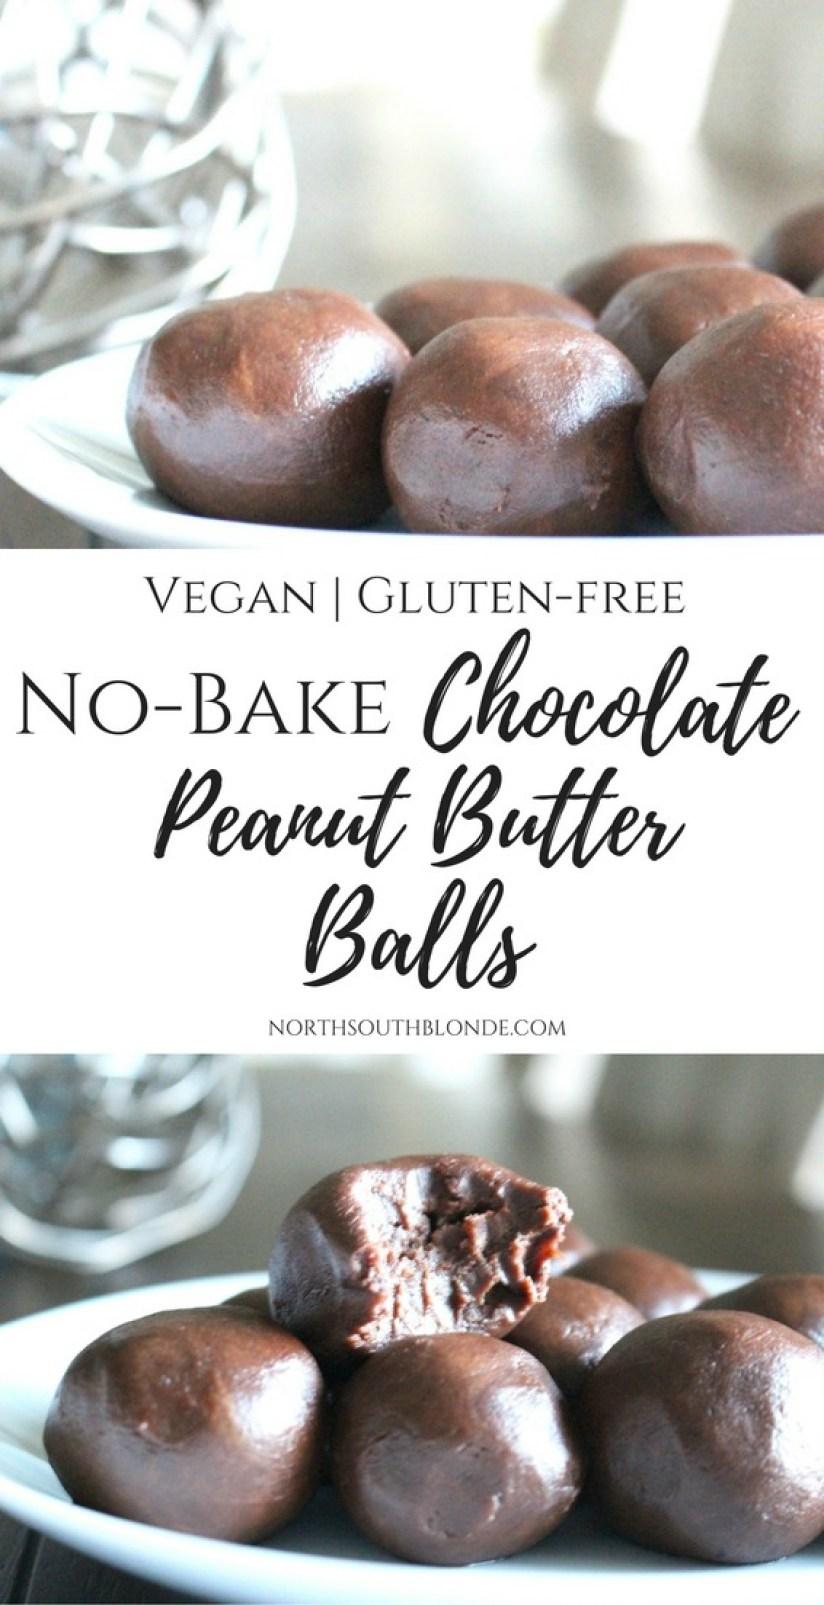 No-Bake Chocolate Peanut Butter Balls (Vegan, Gluten-Free)